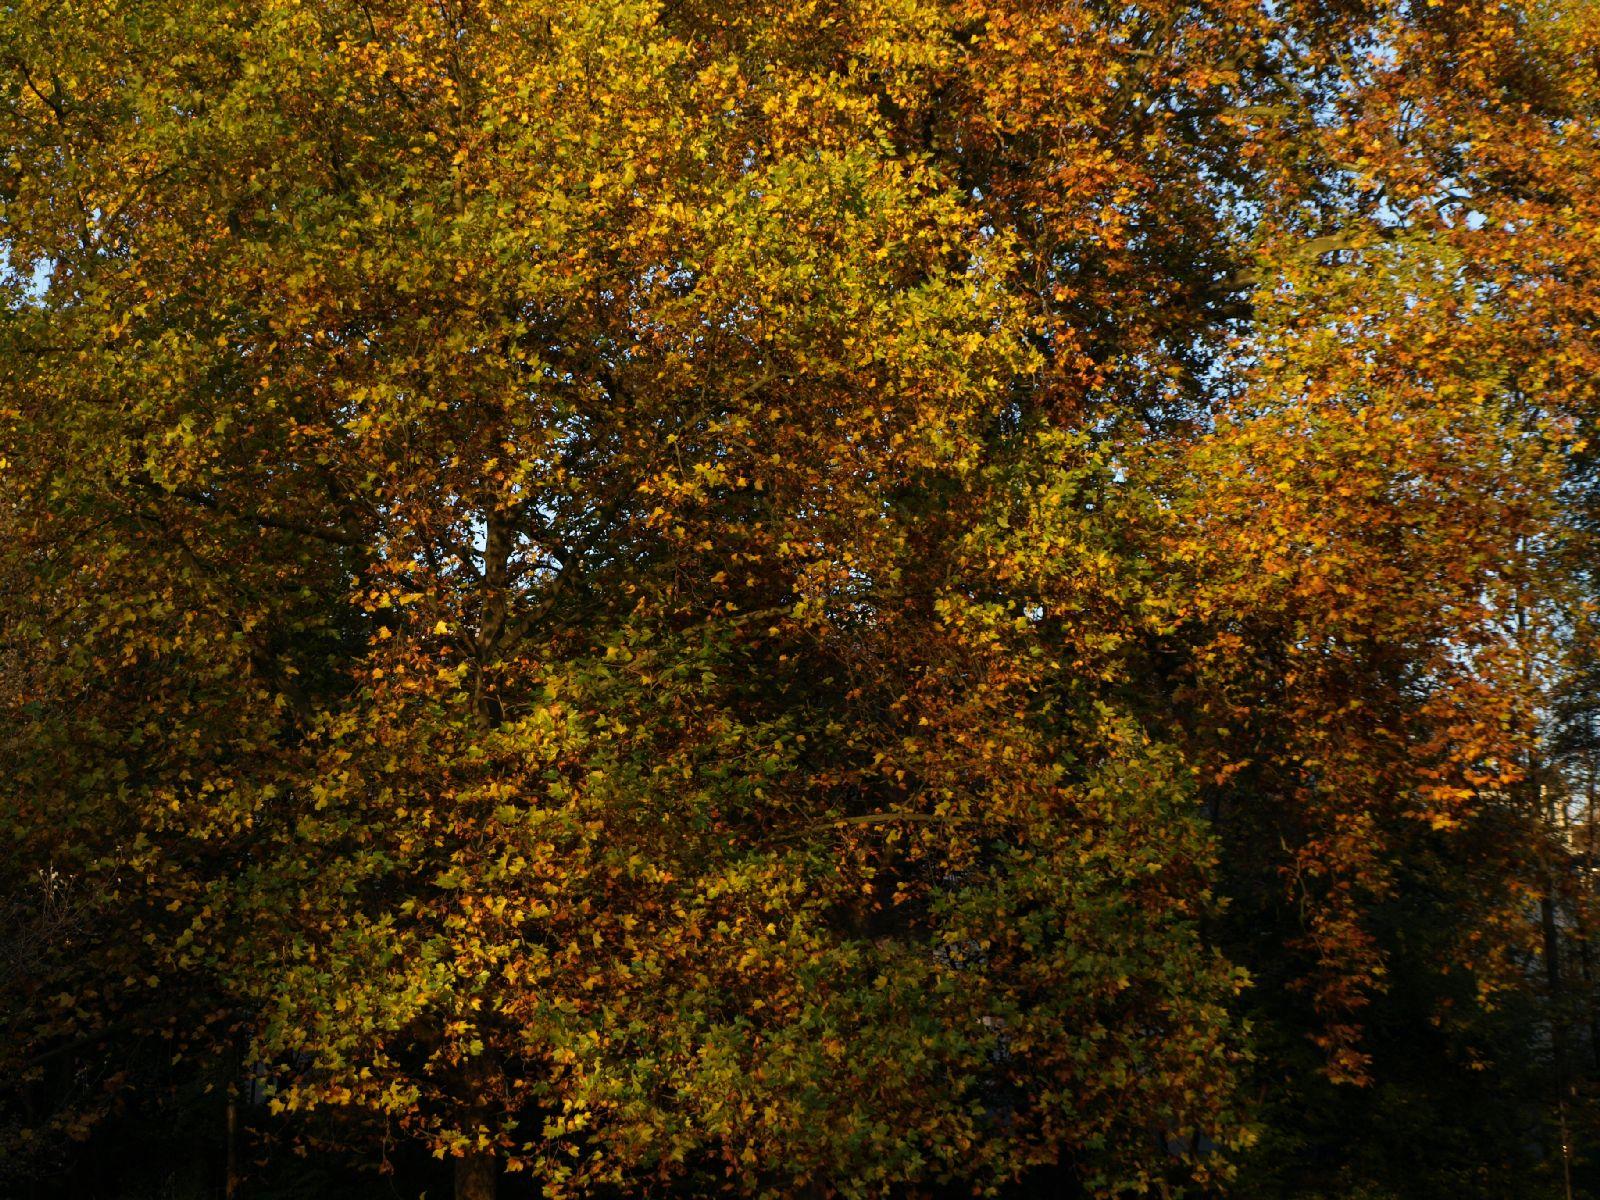 Plants-Trees_Photo_Texture_B_PA256302